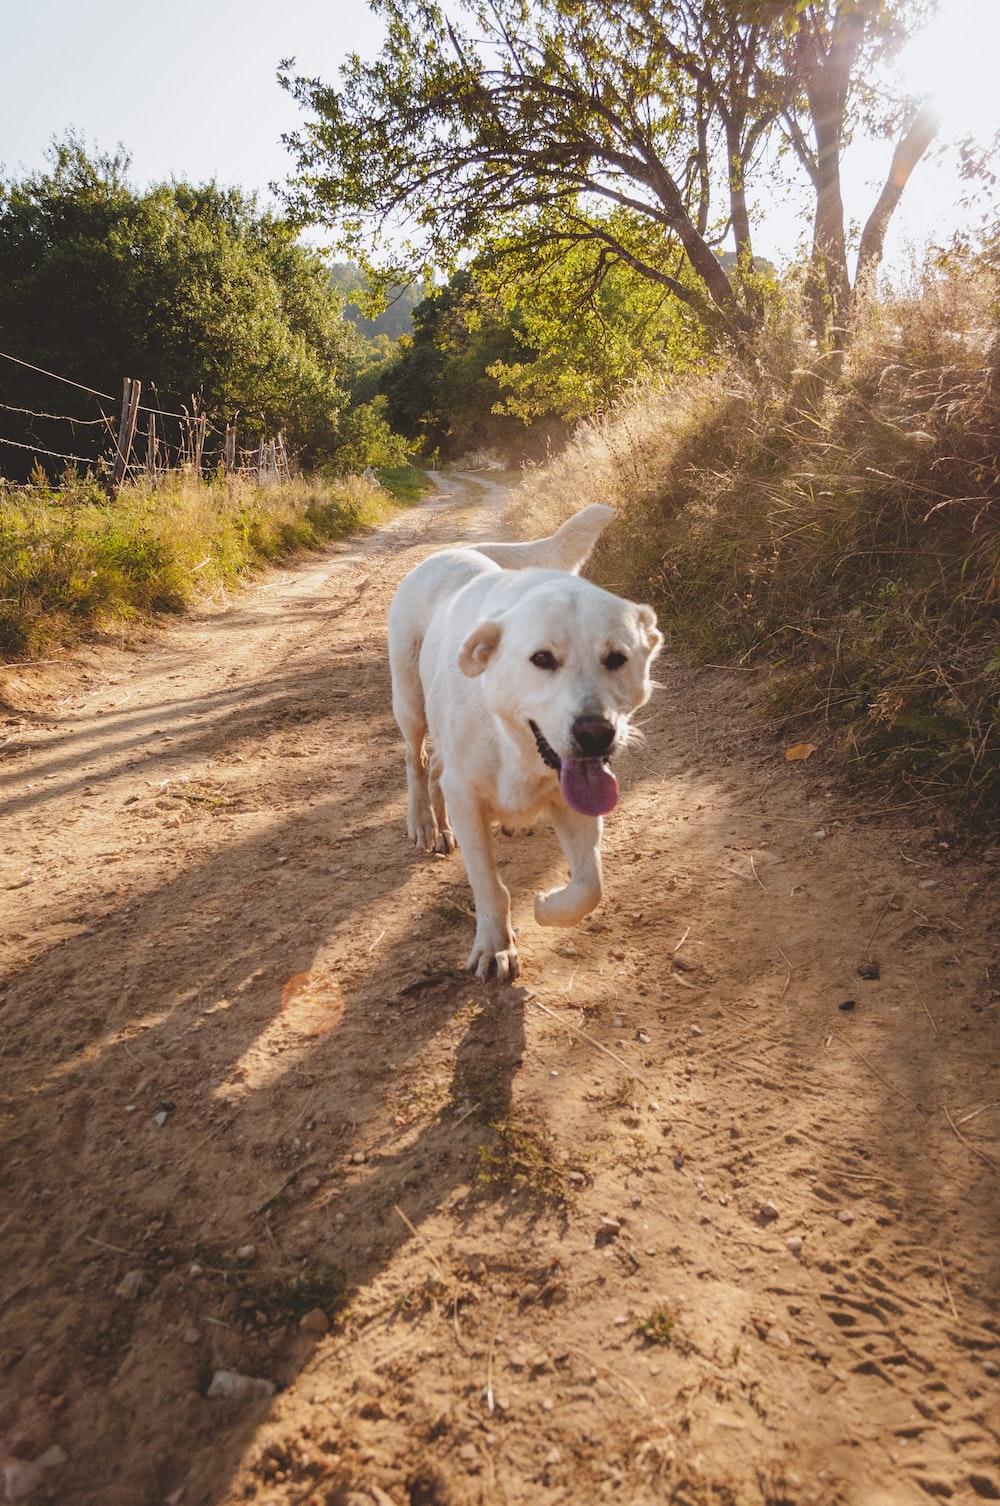 white short coated dog walking on brown dirt road during daytime